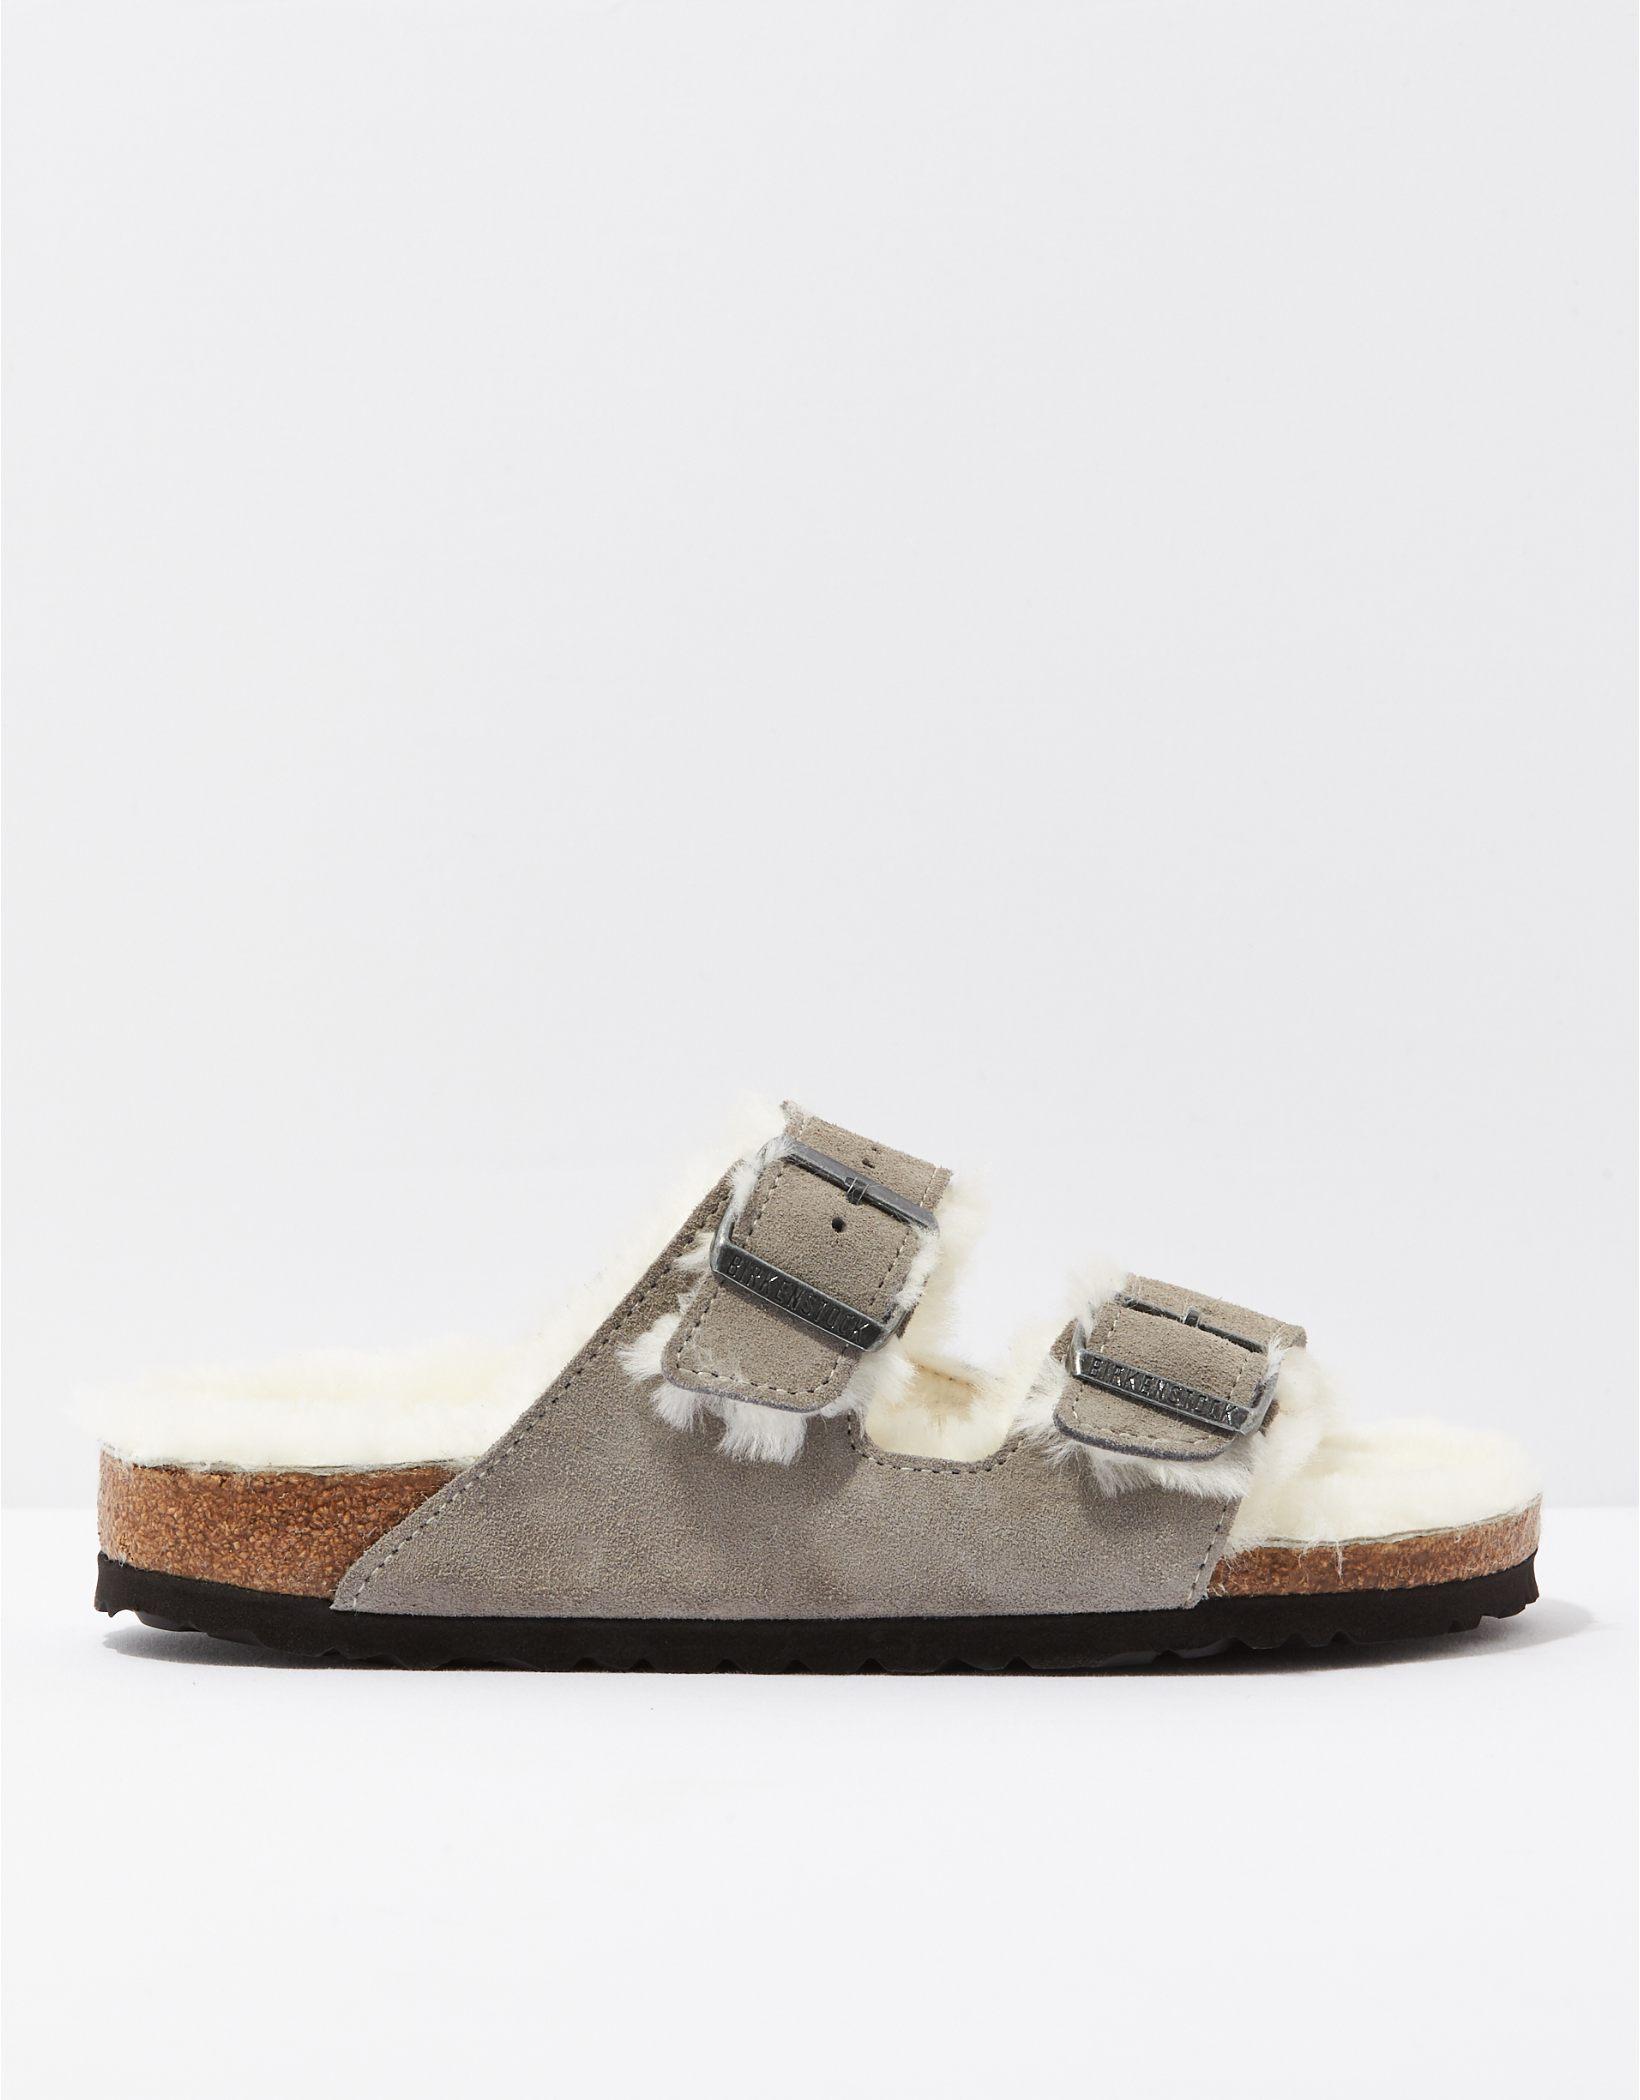 Birkenstock Arizona Shearling Sandal